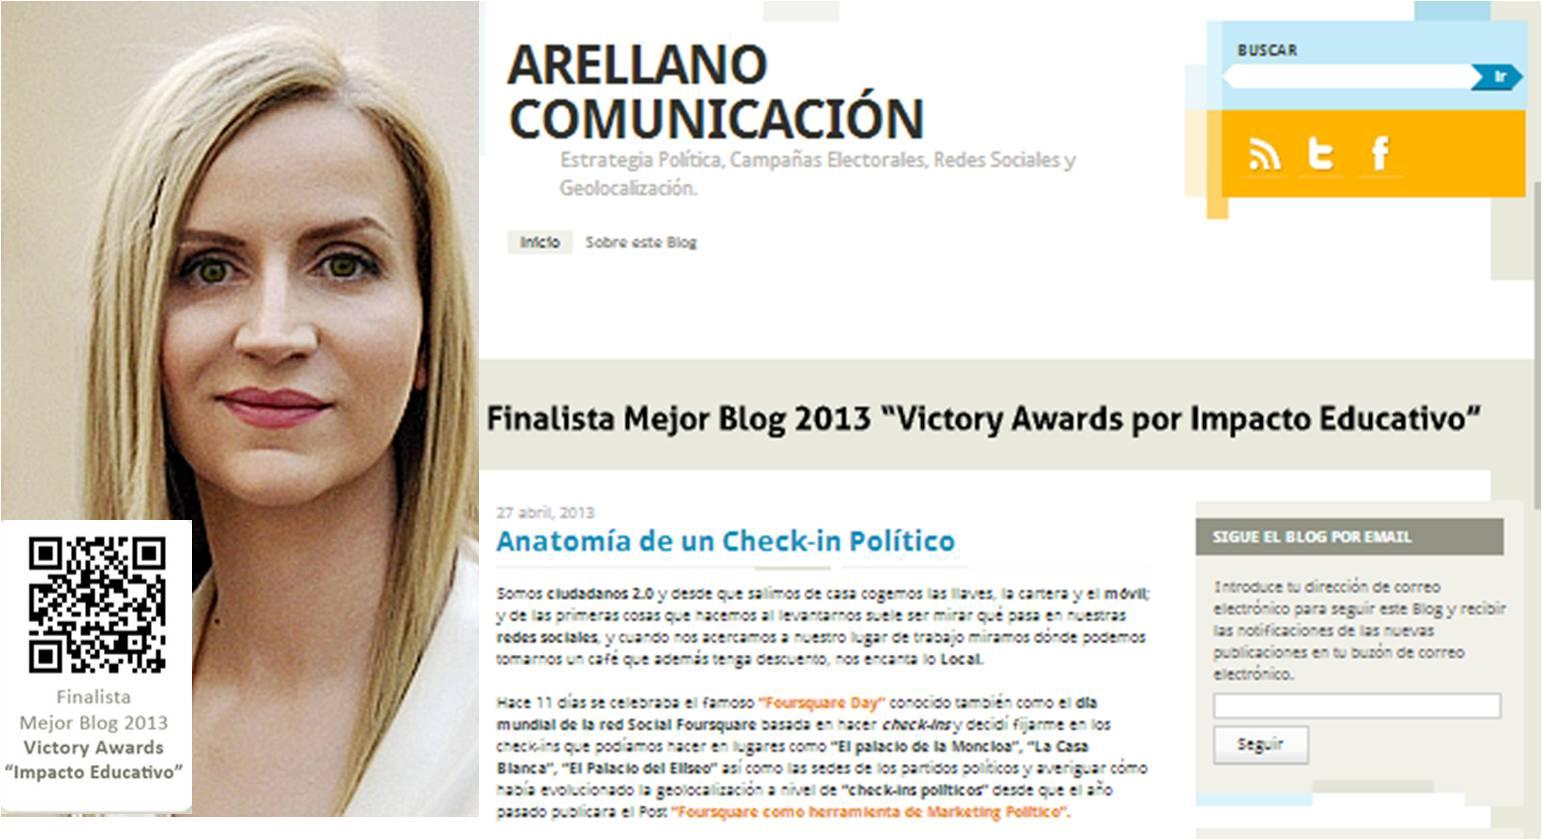 Ana-Ramirez-Arellano